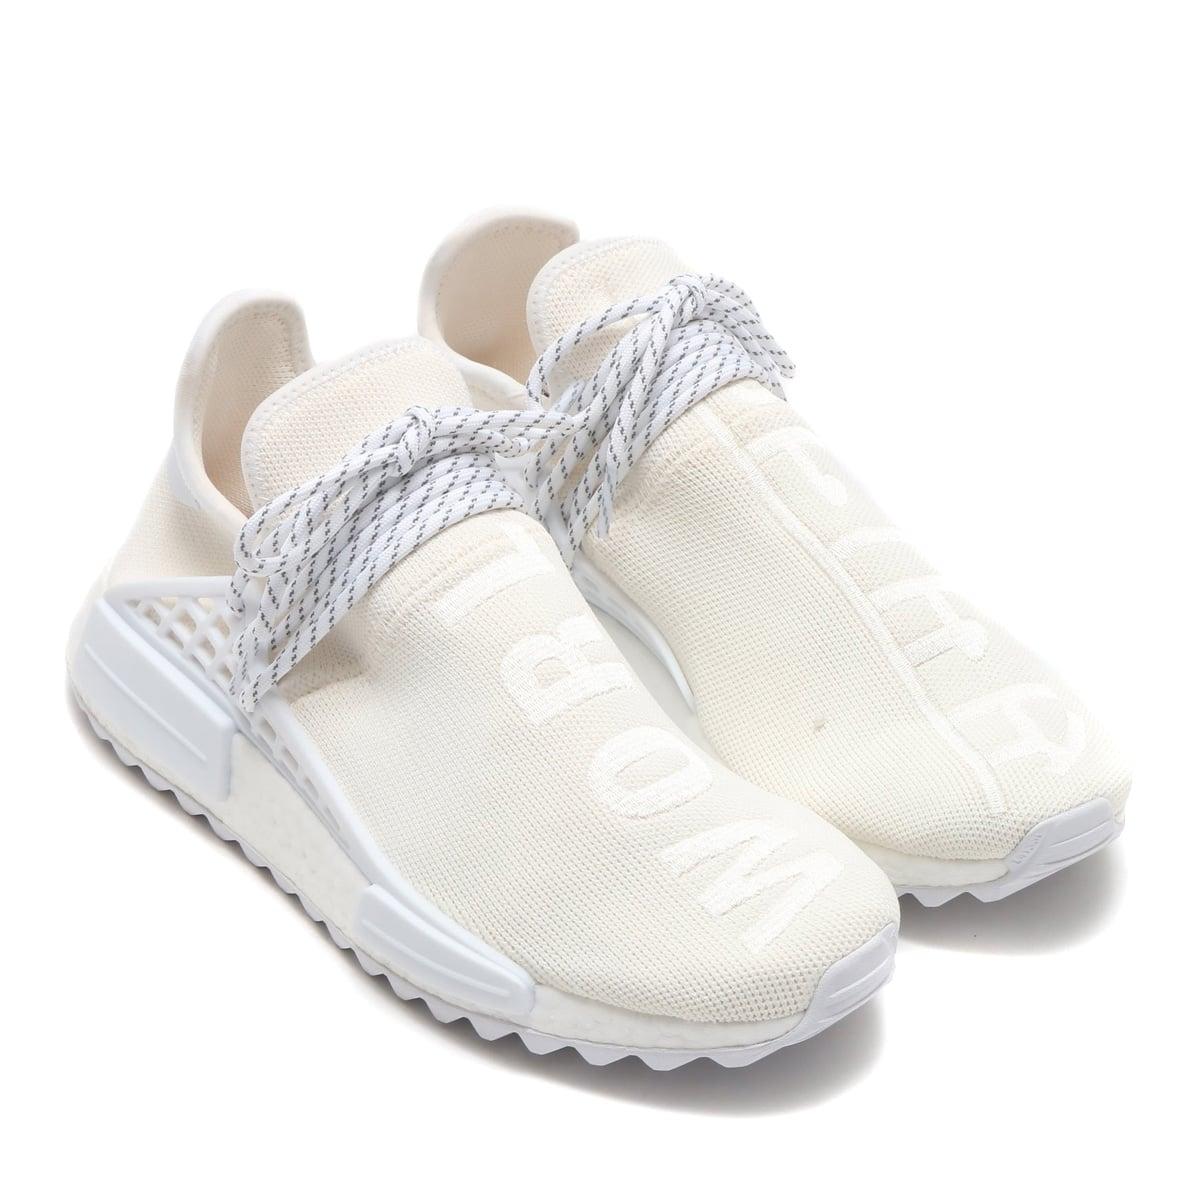 adidas Originals PW HU HOLI NMD BC  Cream White/Ftwr White/Ftwr White_photo_large